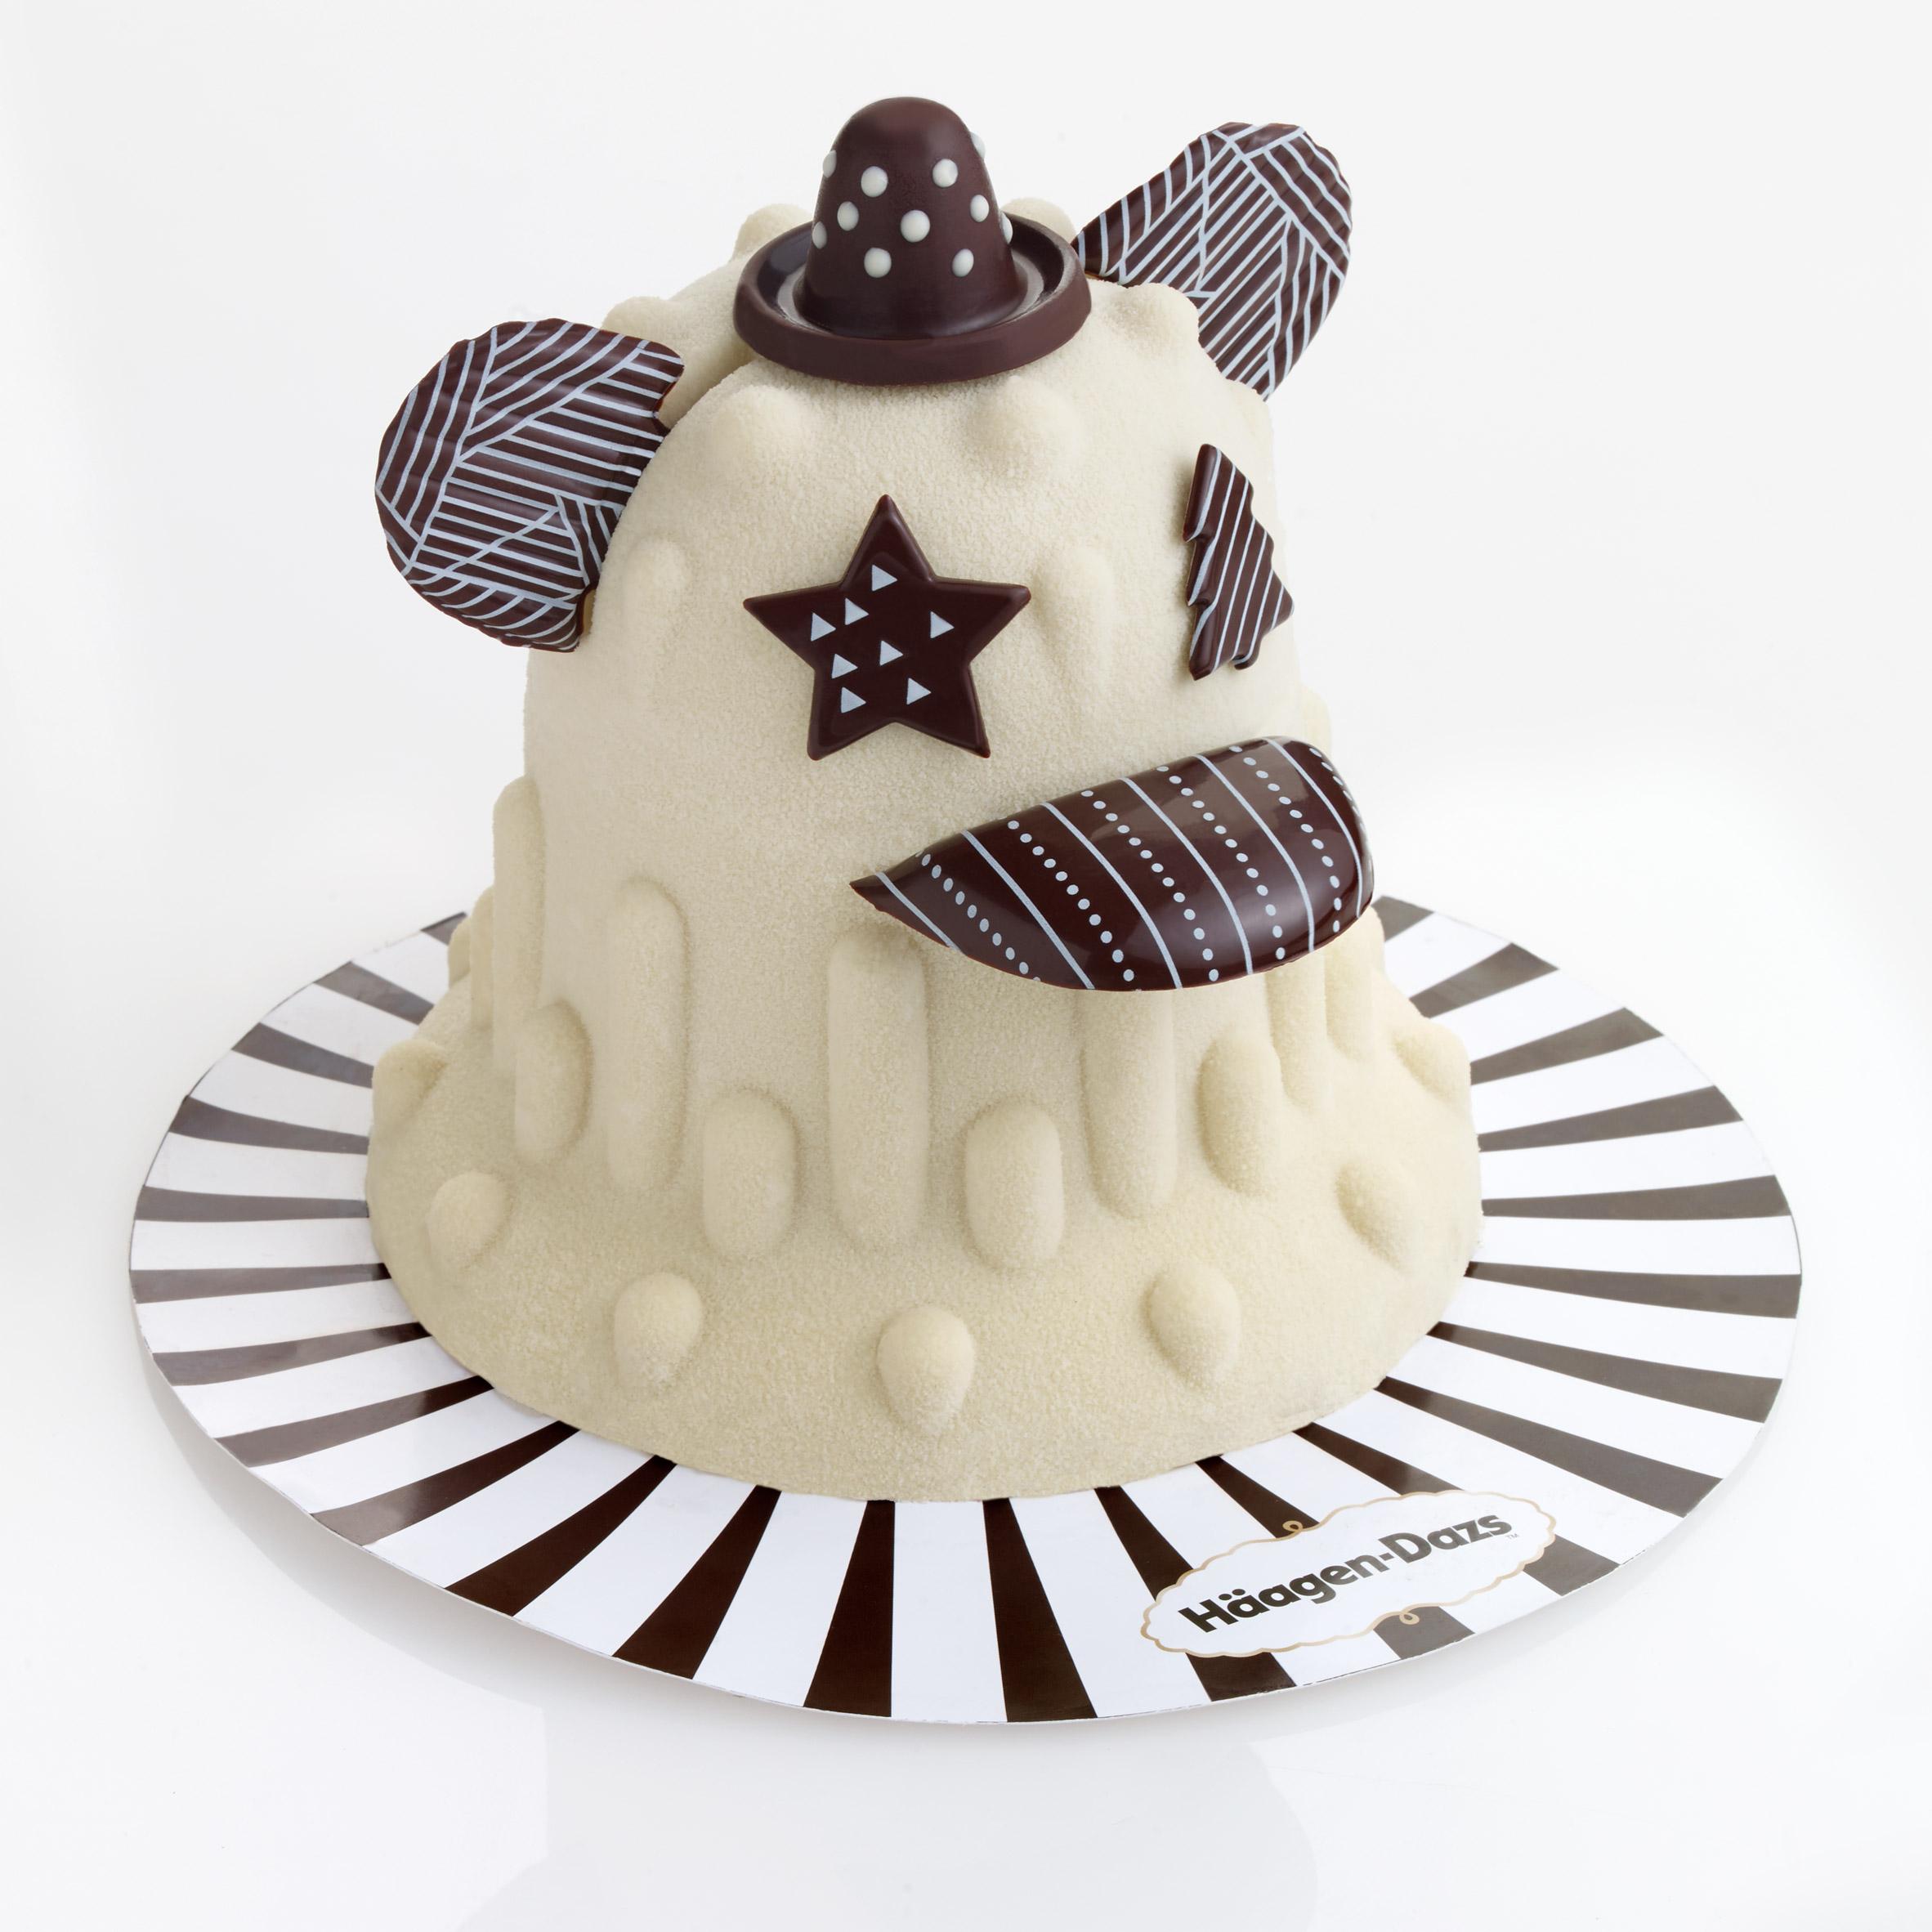 Brilliant Jaime Hayon Designs Ice Cream Cake Creature For Haagen Dazs Personalised Birthday Cards Akebfashionlily Jamesorg